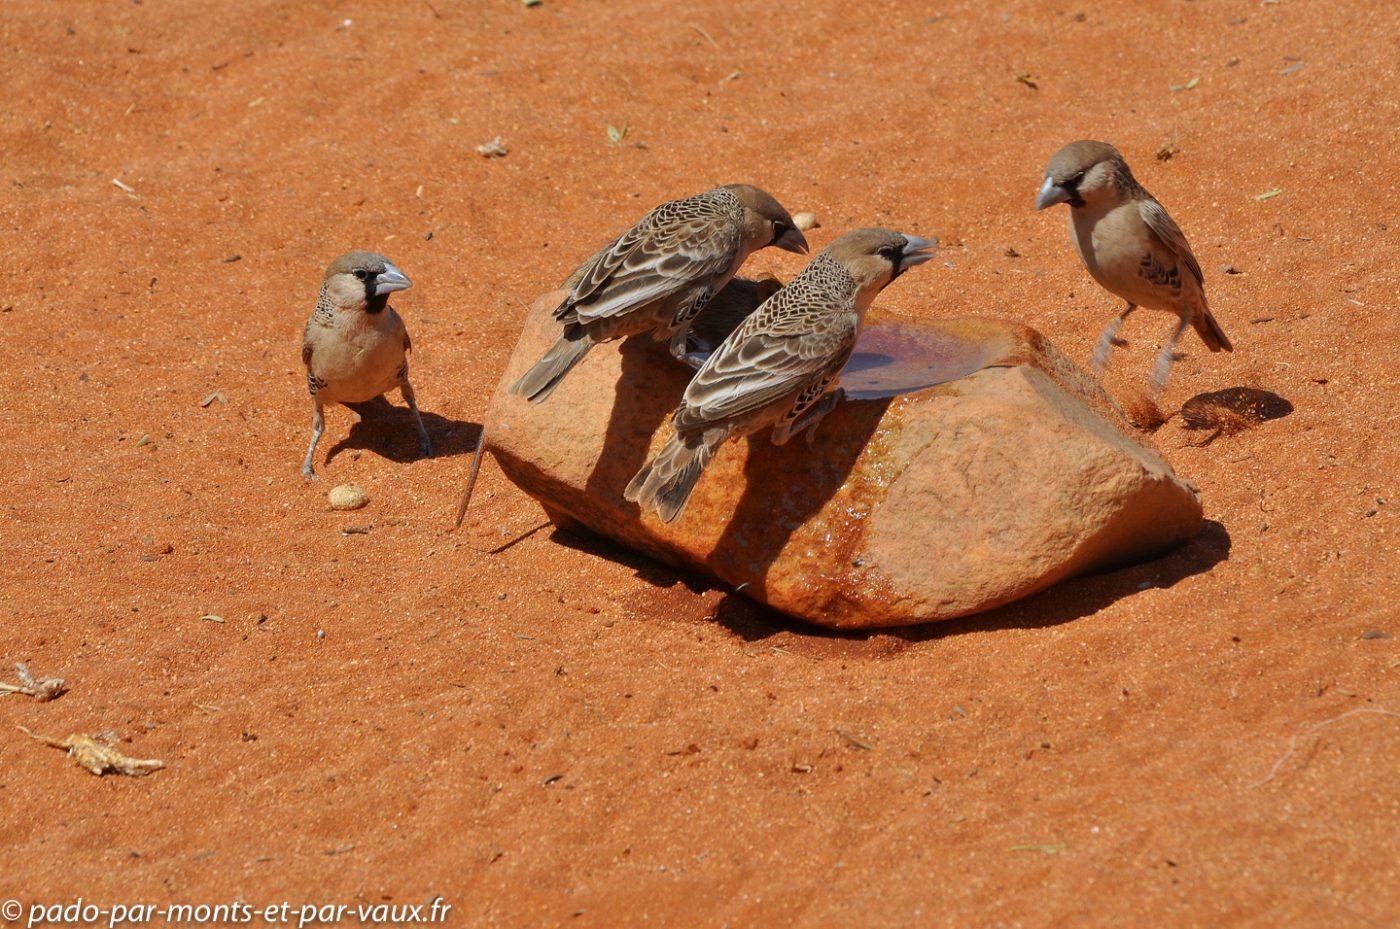 Namibie 2013 - Tok Tokkie trail - Republicains sociaux